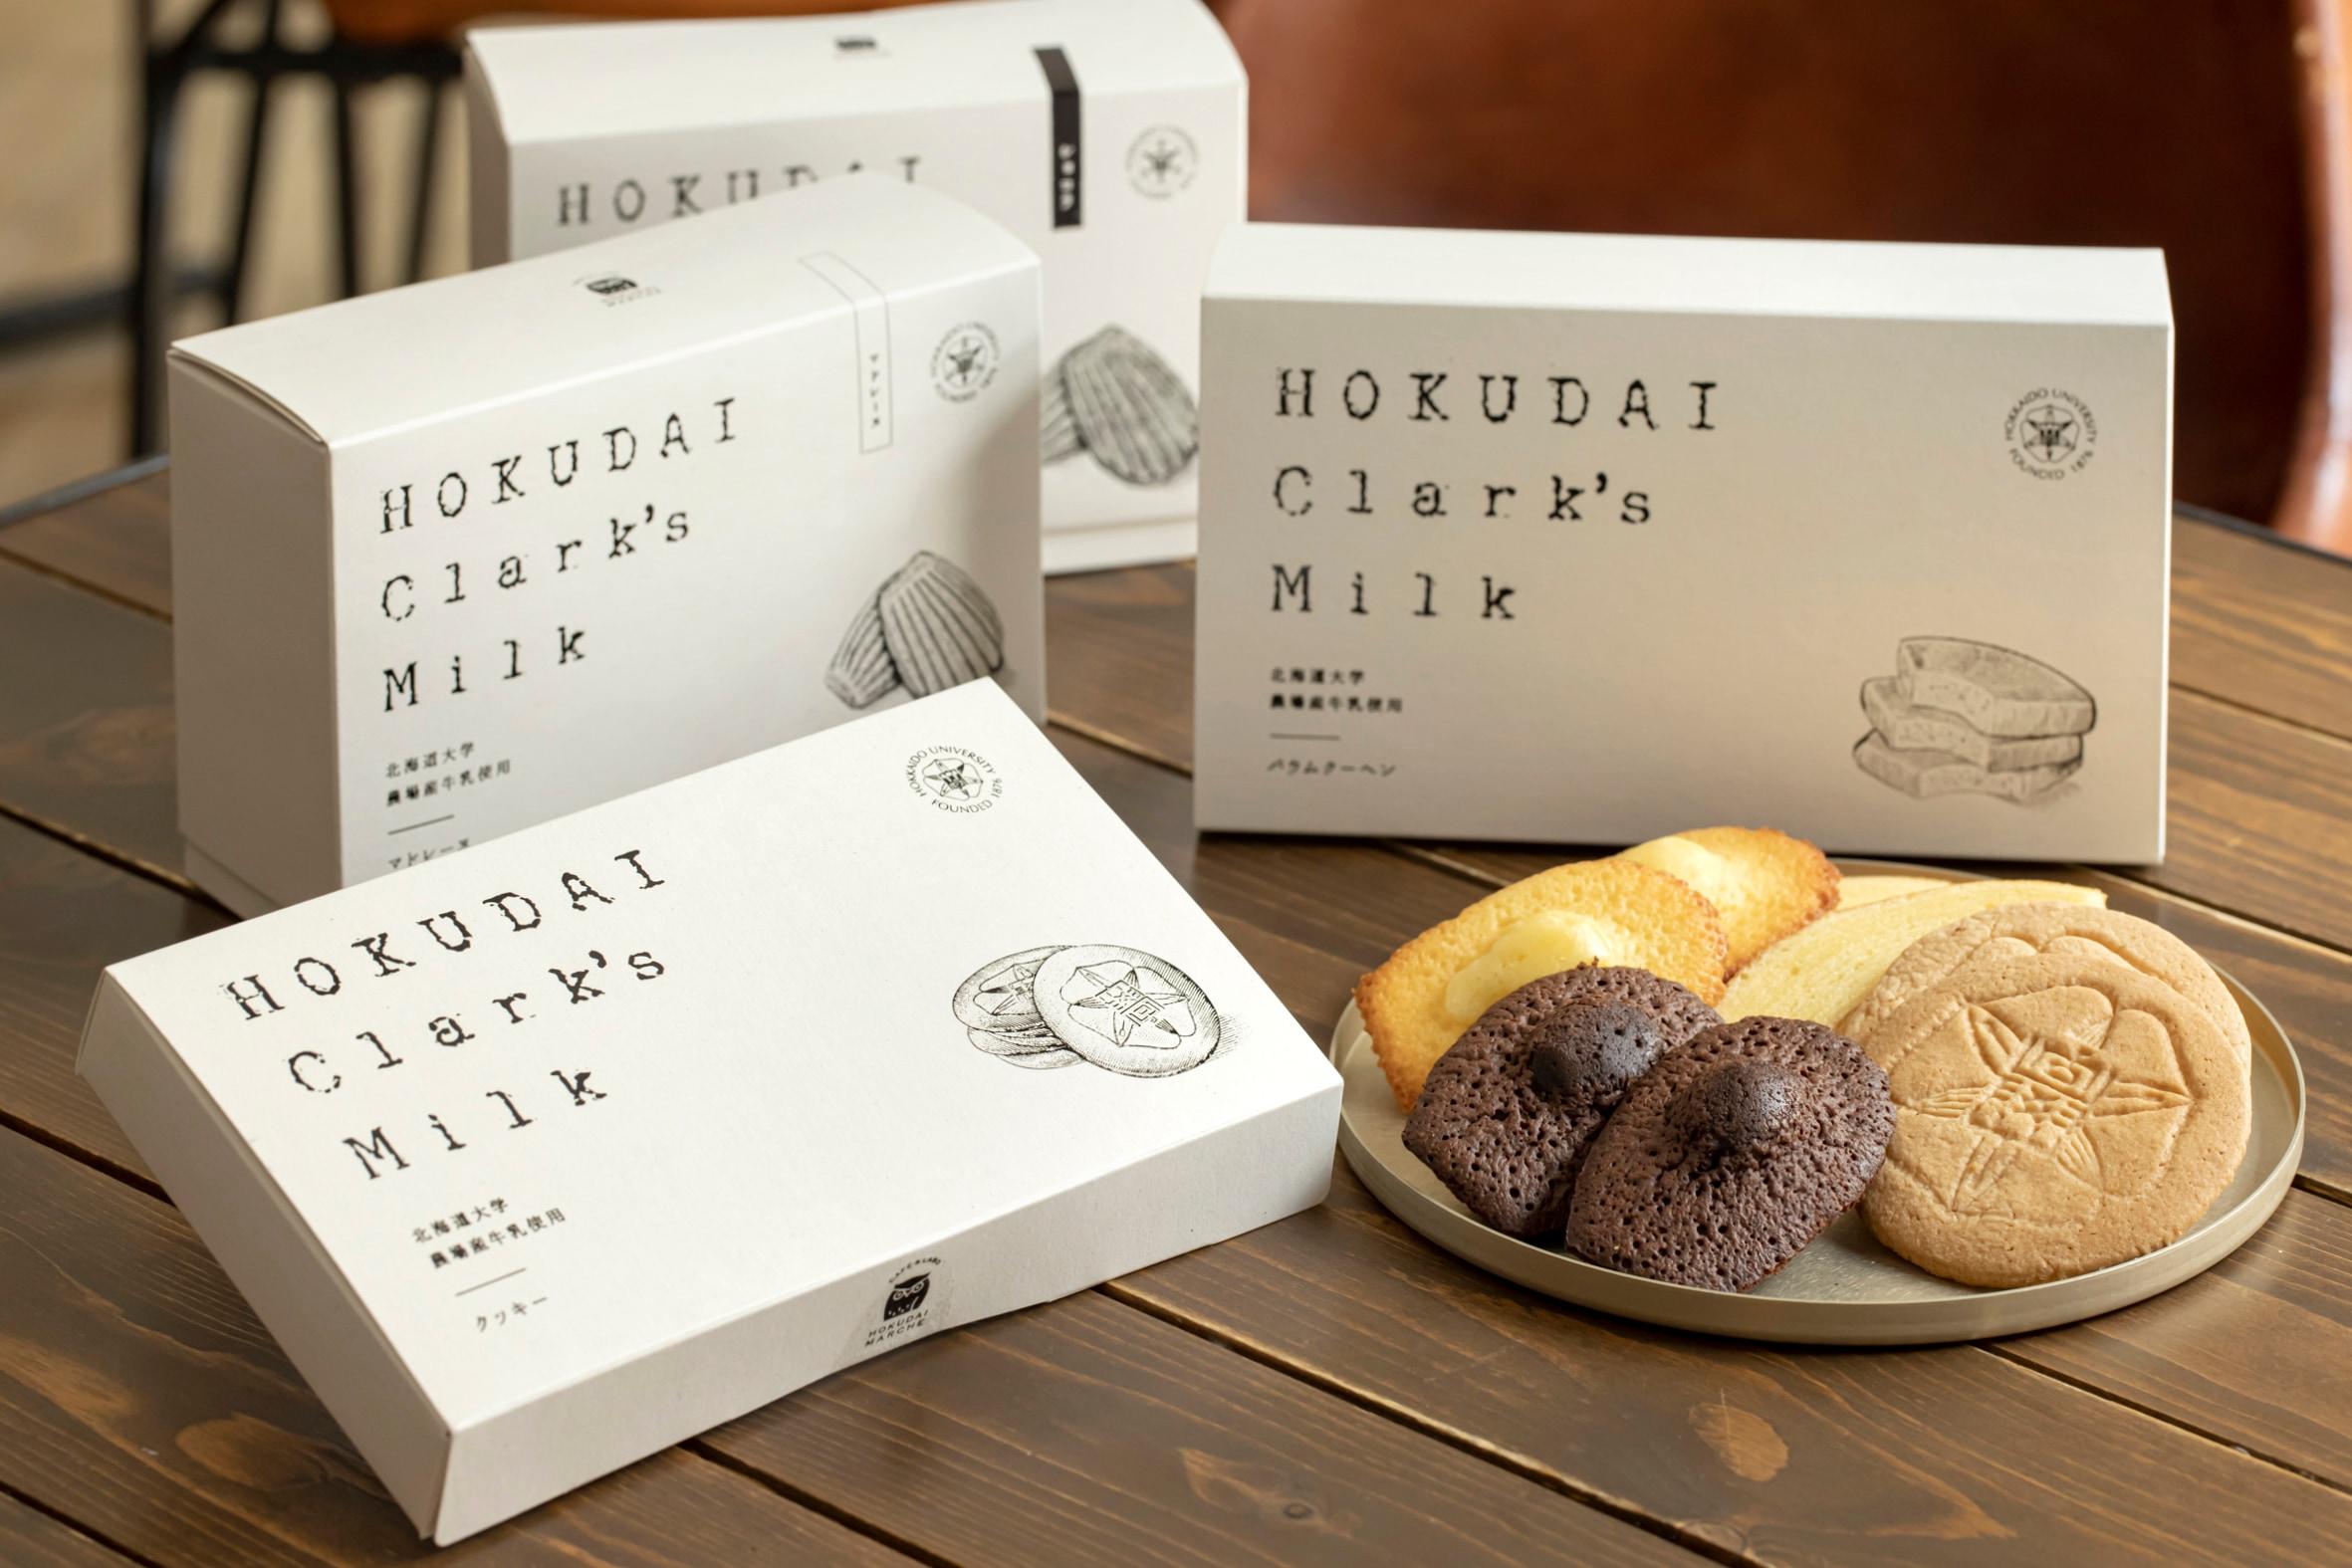 HOKUDAI Clark's Milk 焼き菓子4種セット,北大マルシェ Cafe & Laboの通販・お取り寄せ焼き菓子セット